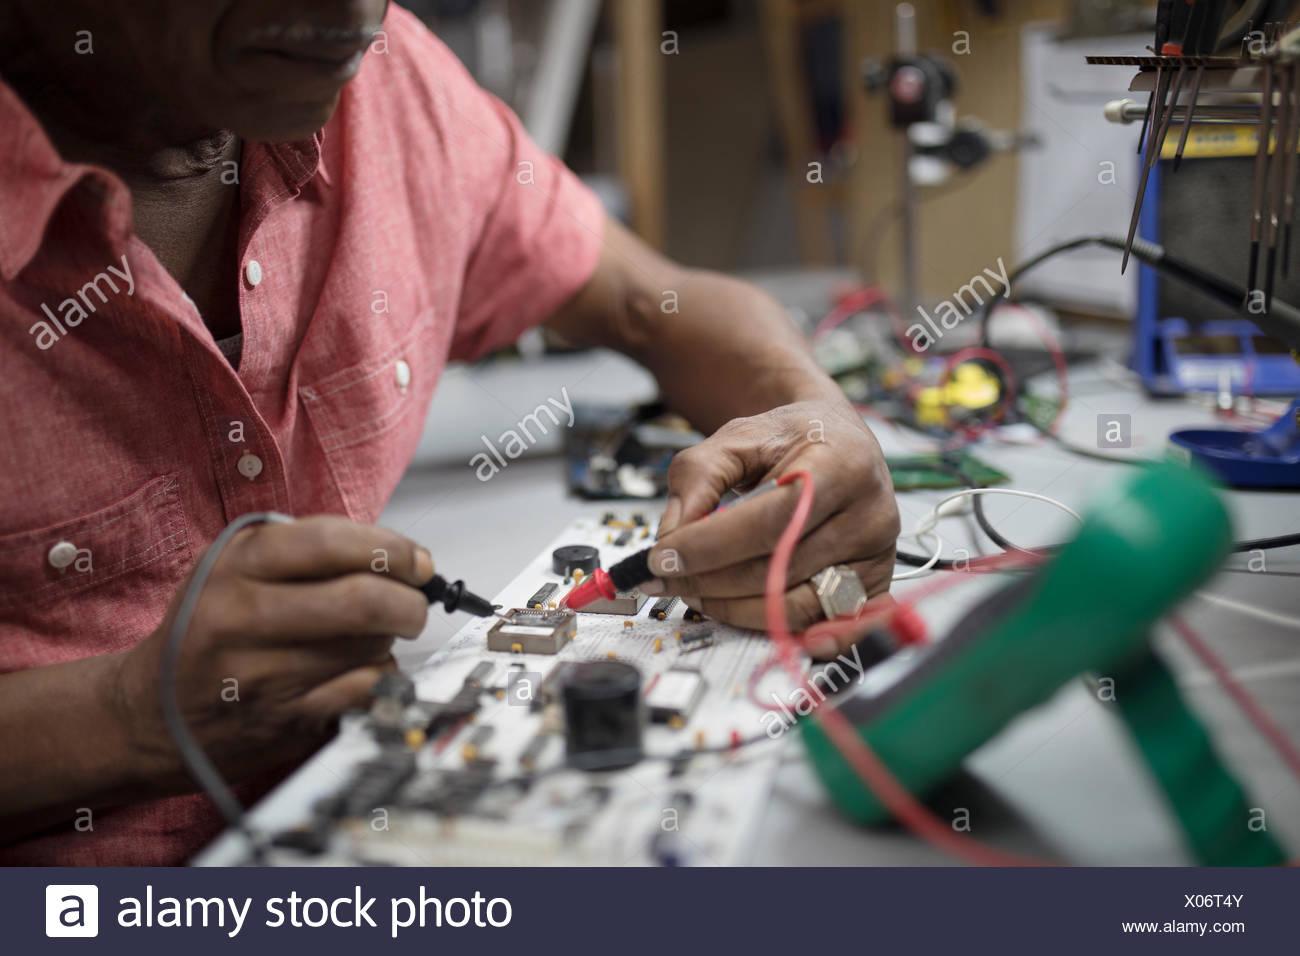 Close up male engineer using soldering iron on electronics - Stock Image